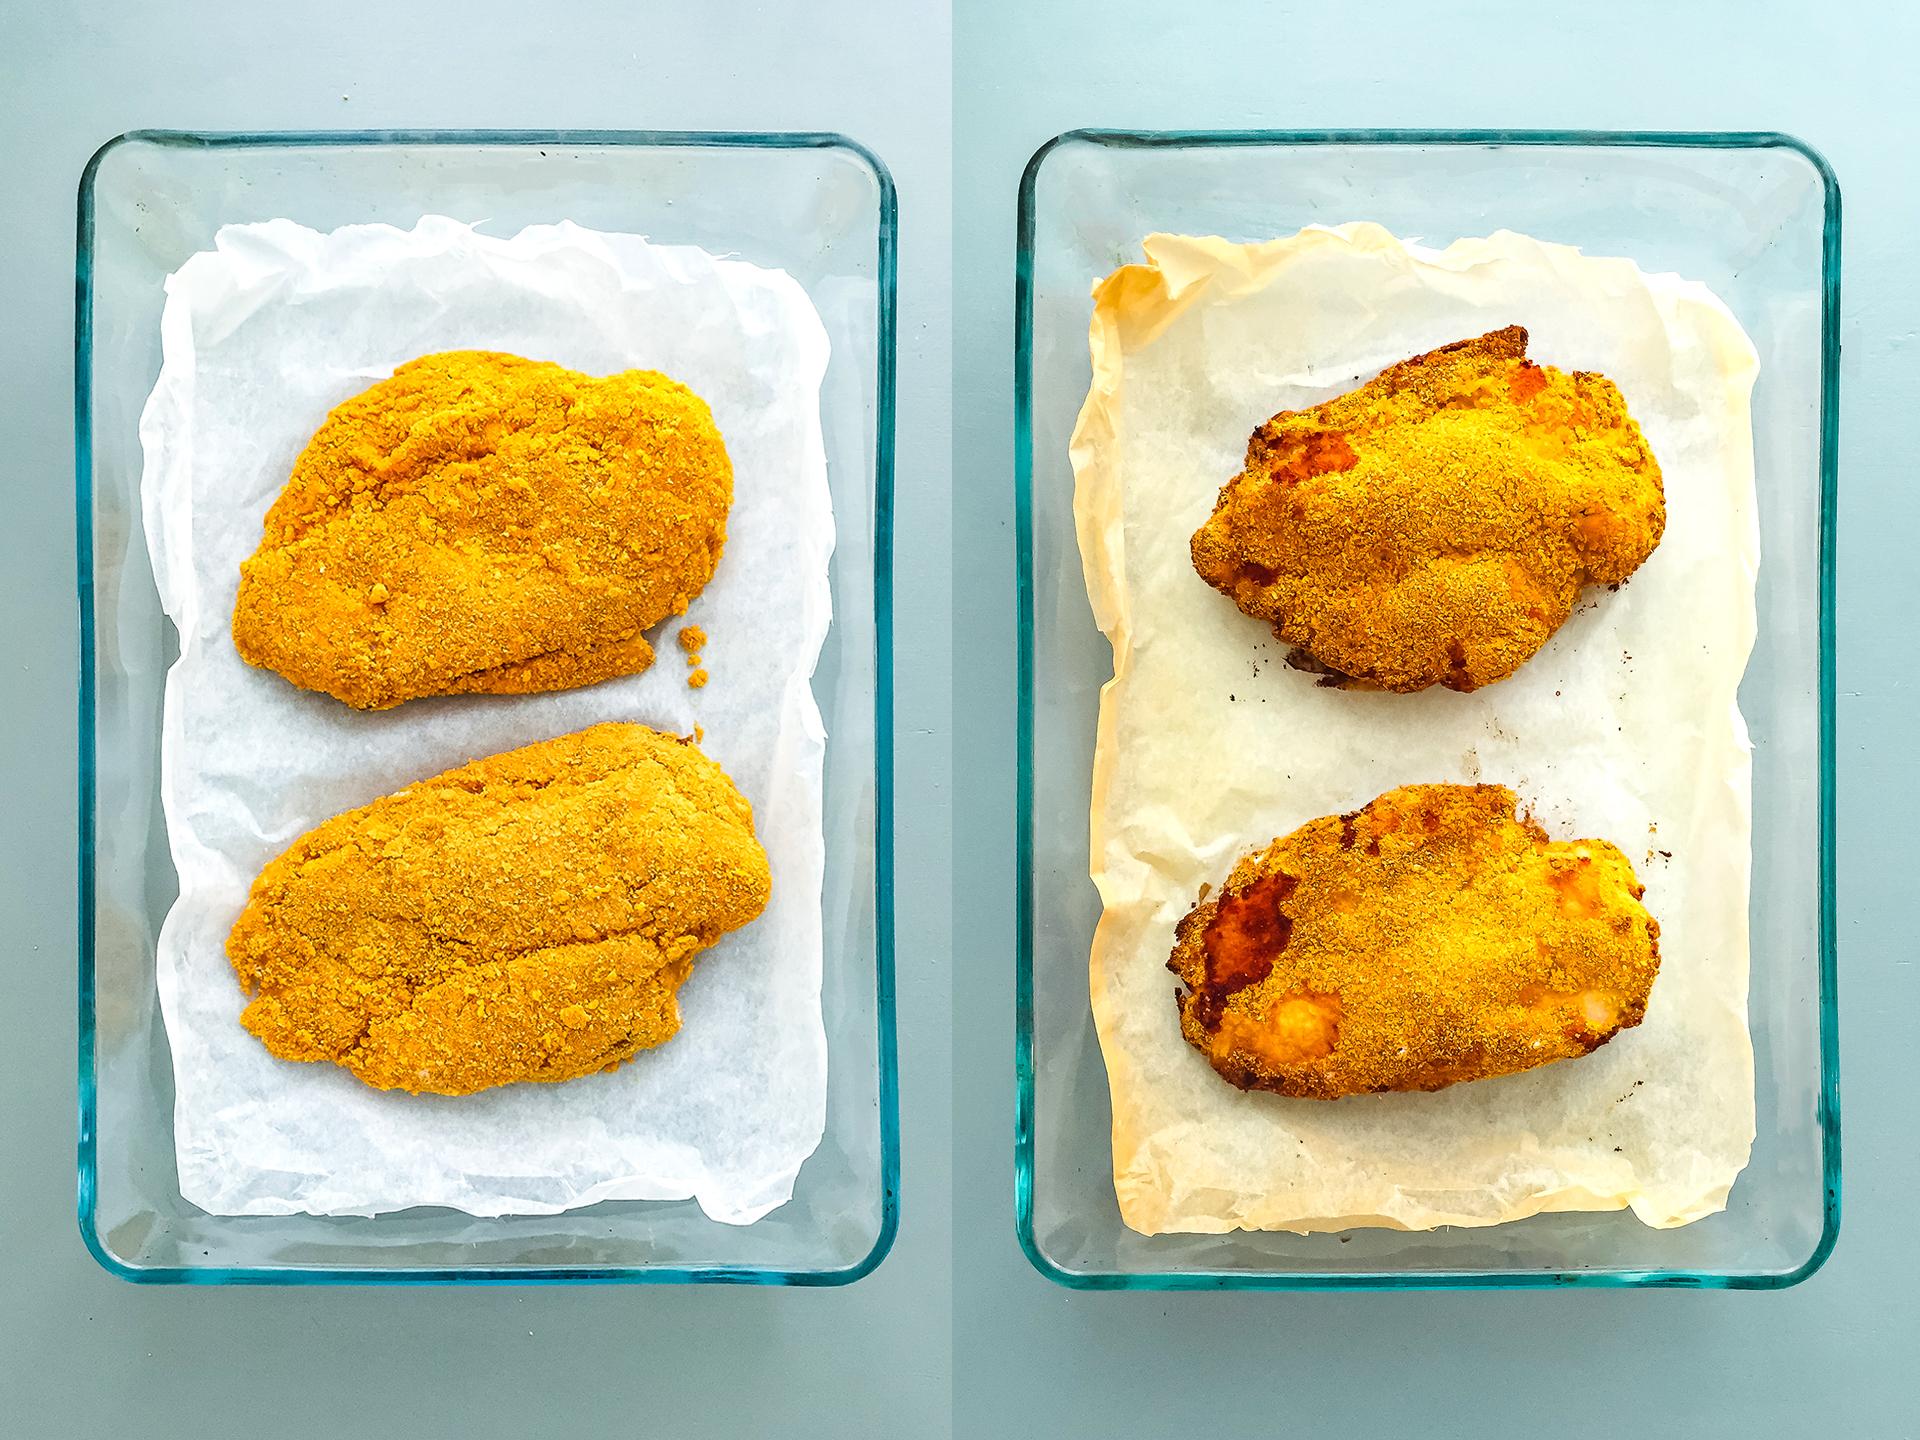 Step 3.1 of High protein Breaded Chicken Cordon Bleu